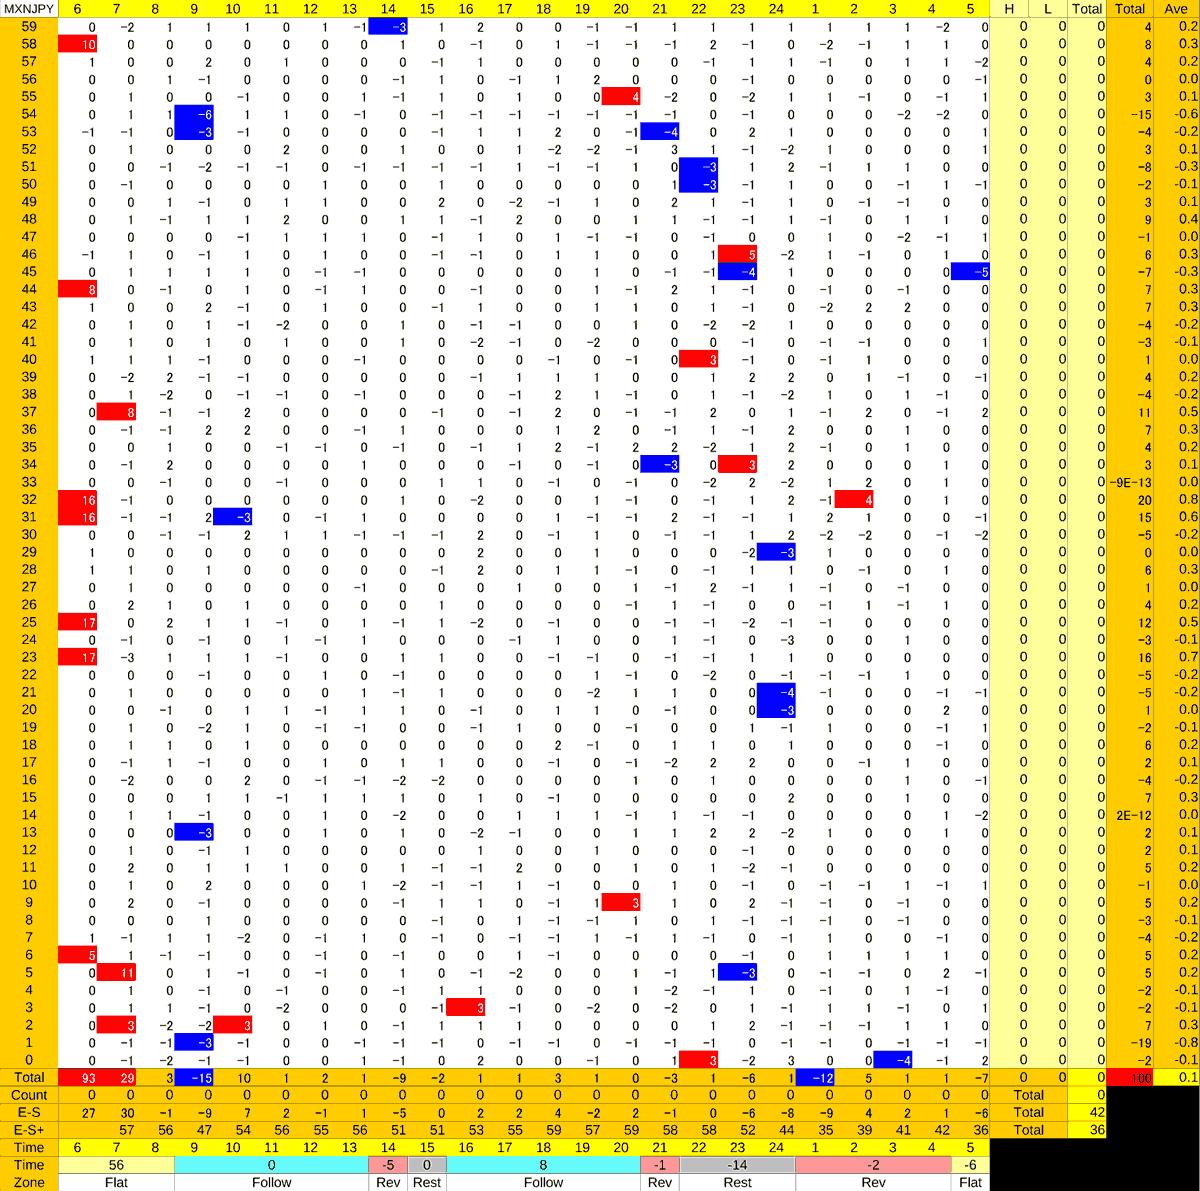 20200831_HS(3)MXNJPY